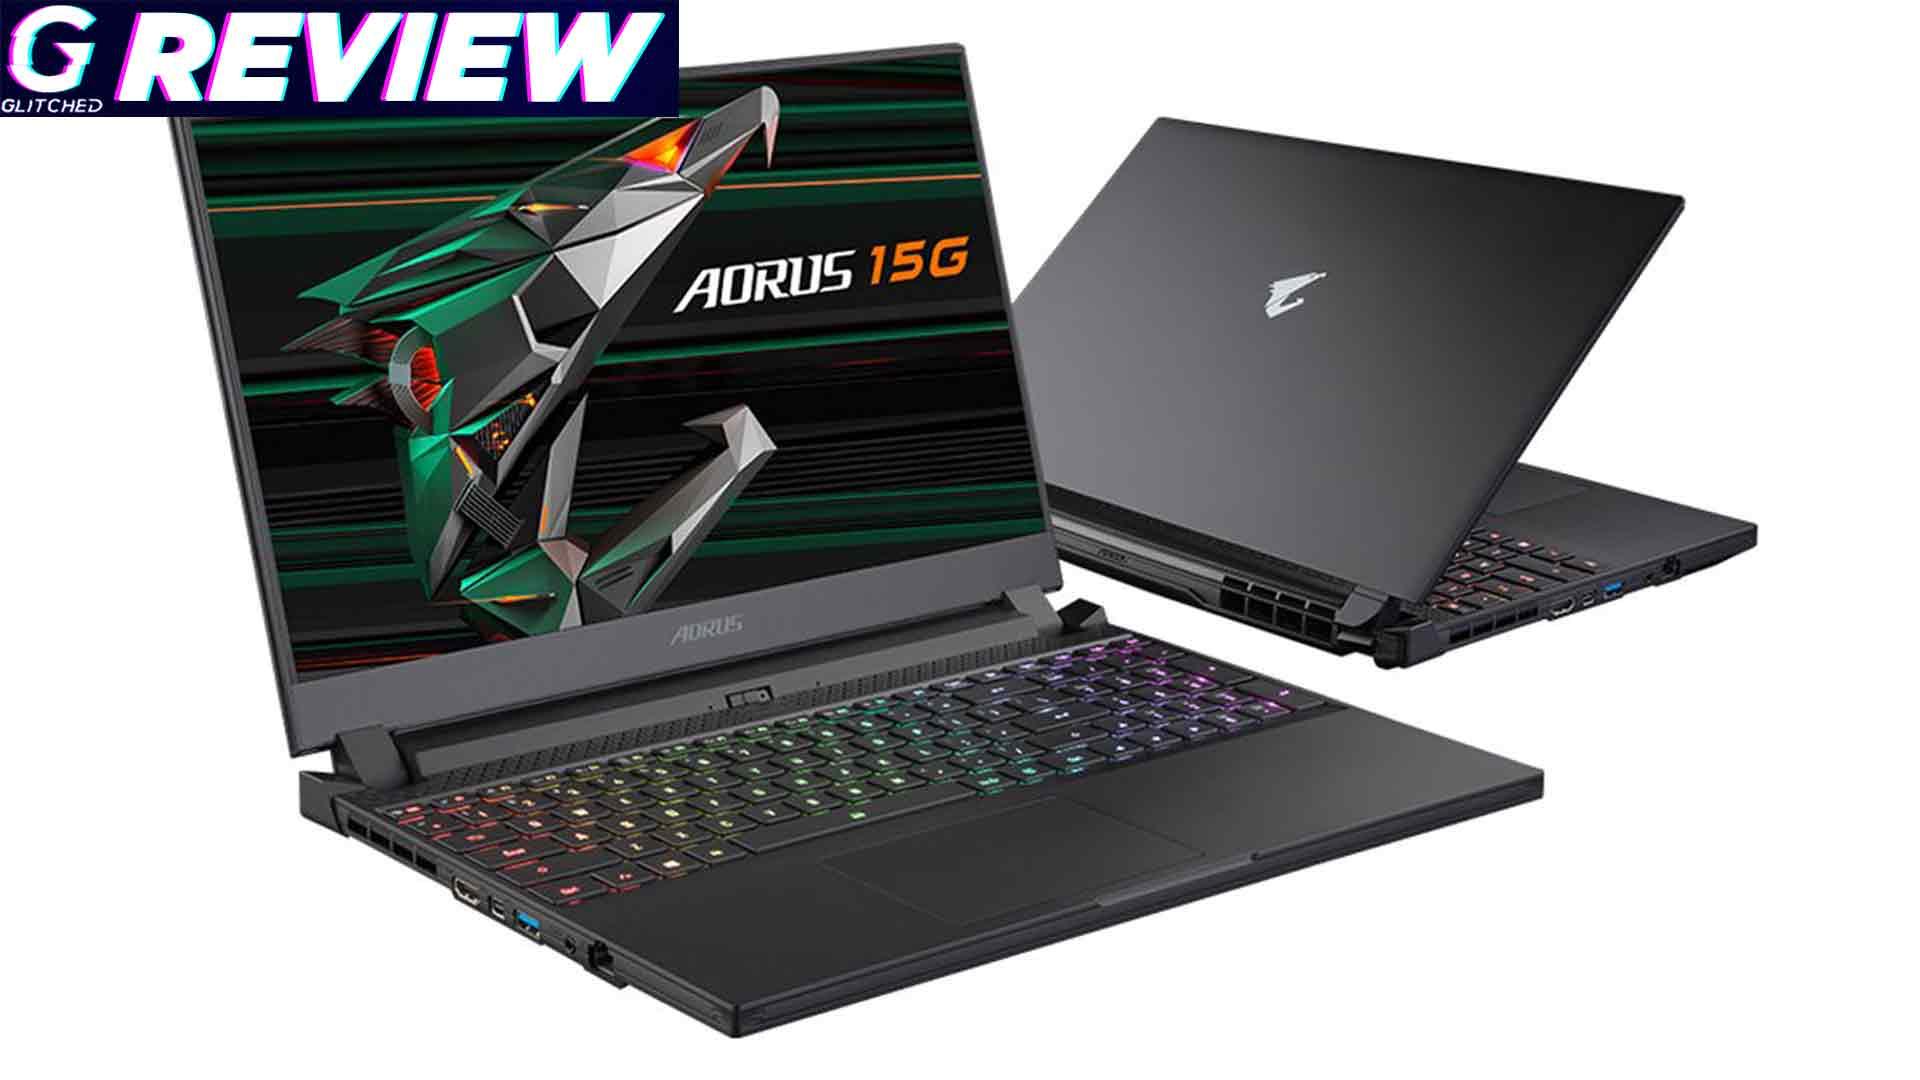 Gigabyte Aorus 15G RTX 3070 Gaming Notebook Review